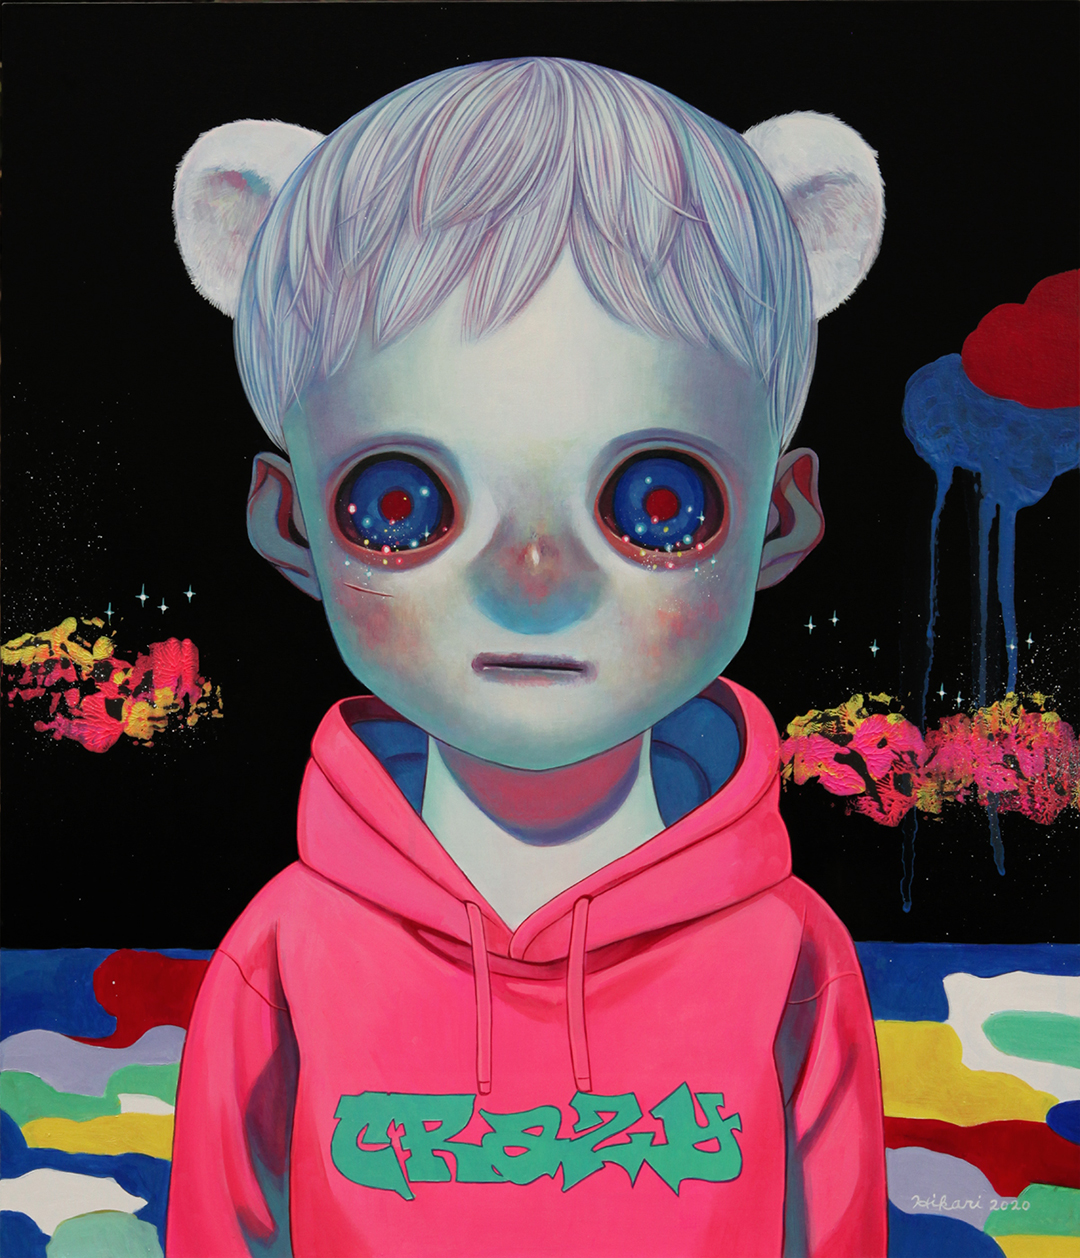 GirlsclubAsia-Artist-Hikari Shimoda_Hidden in the Night (Polar Bear)_Oil on canvas_20.9 x 17.9